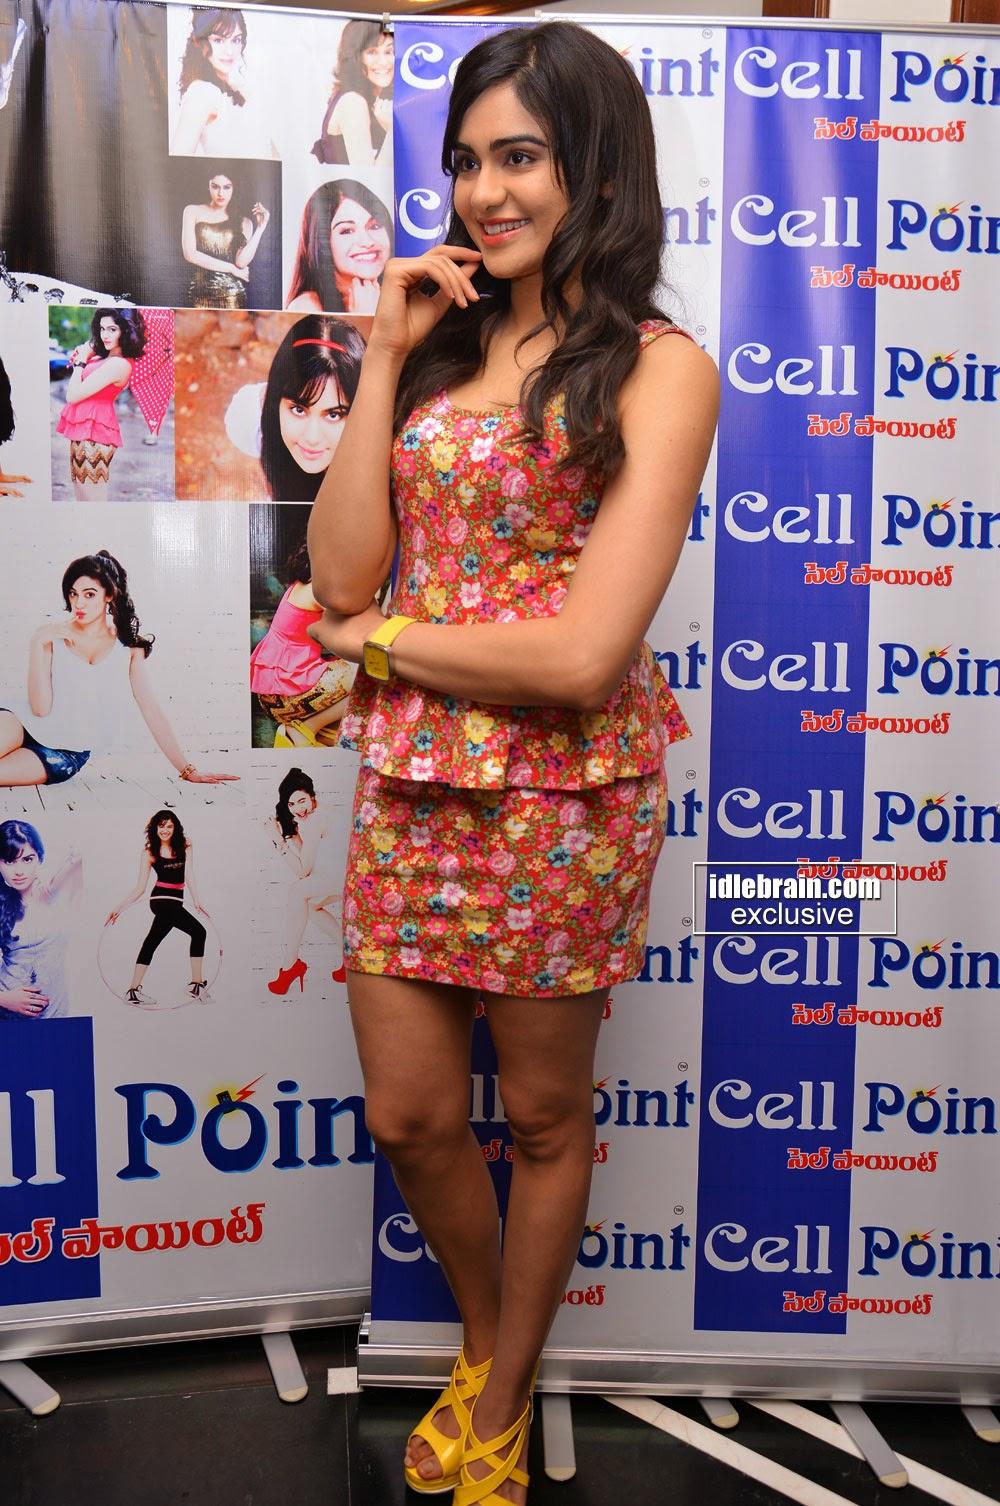 Adah Sharma as brand ambassador for Cell Point